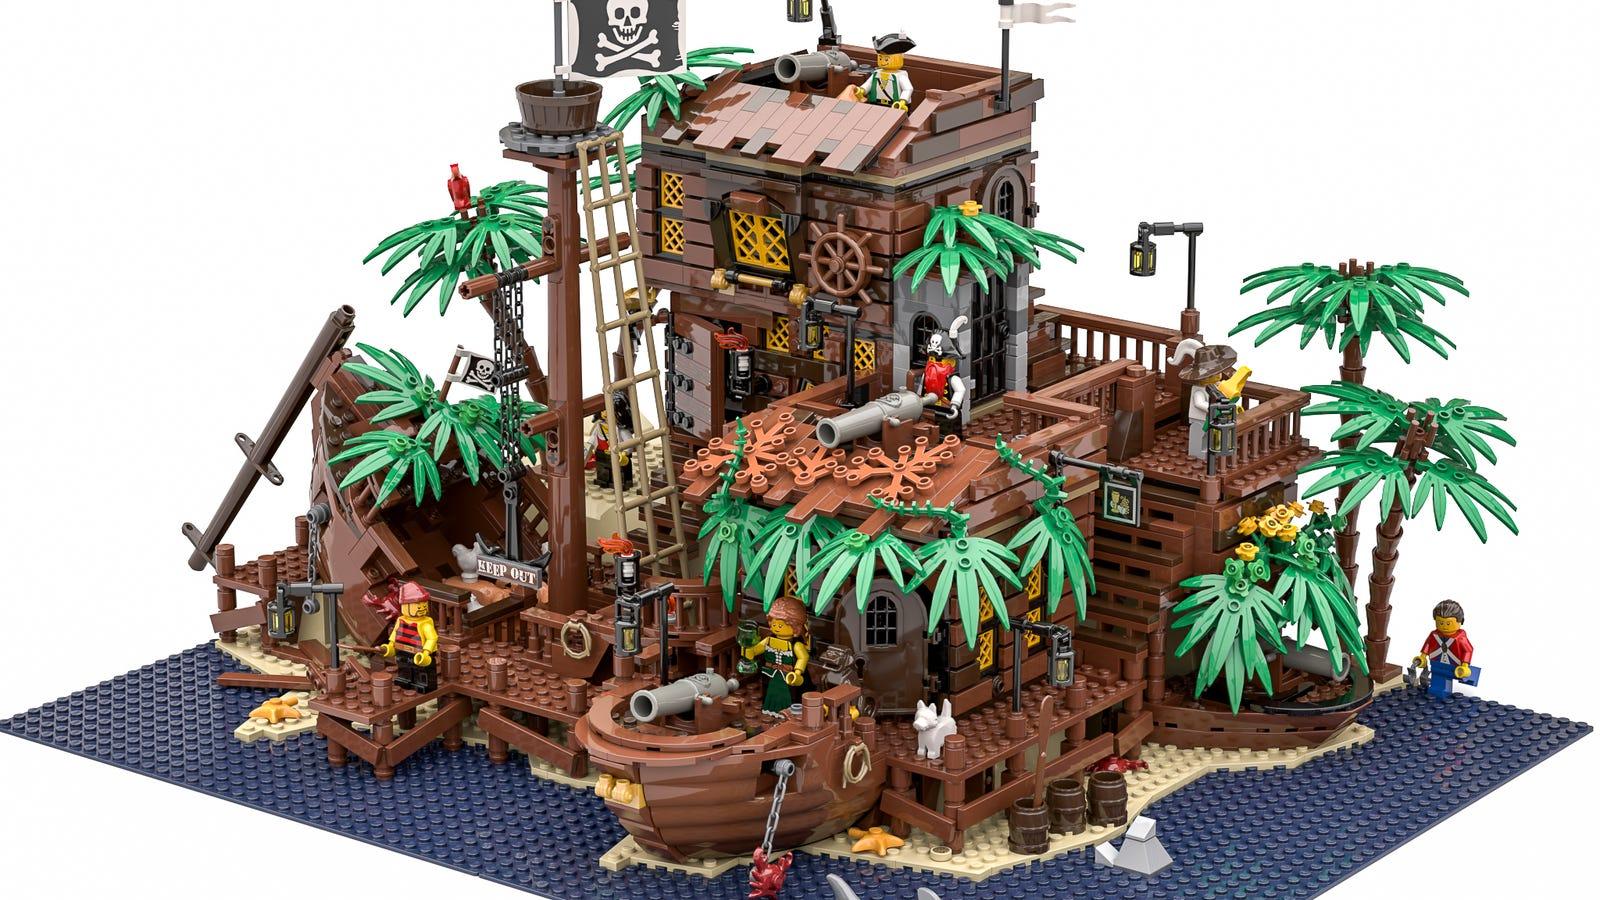 Please Lego Make This Pirate Island